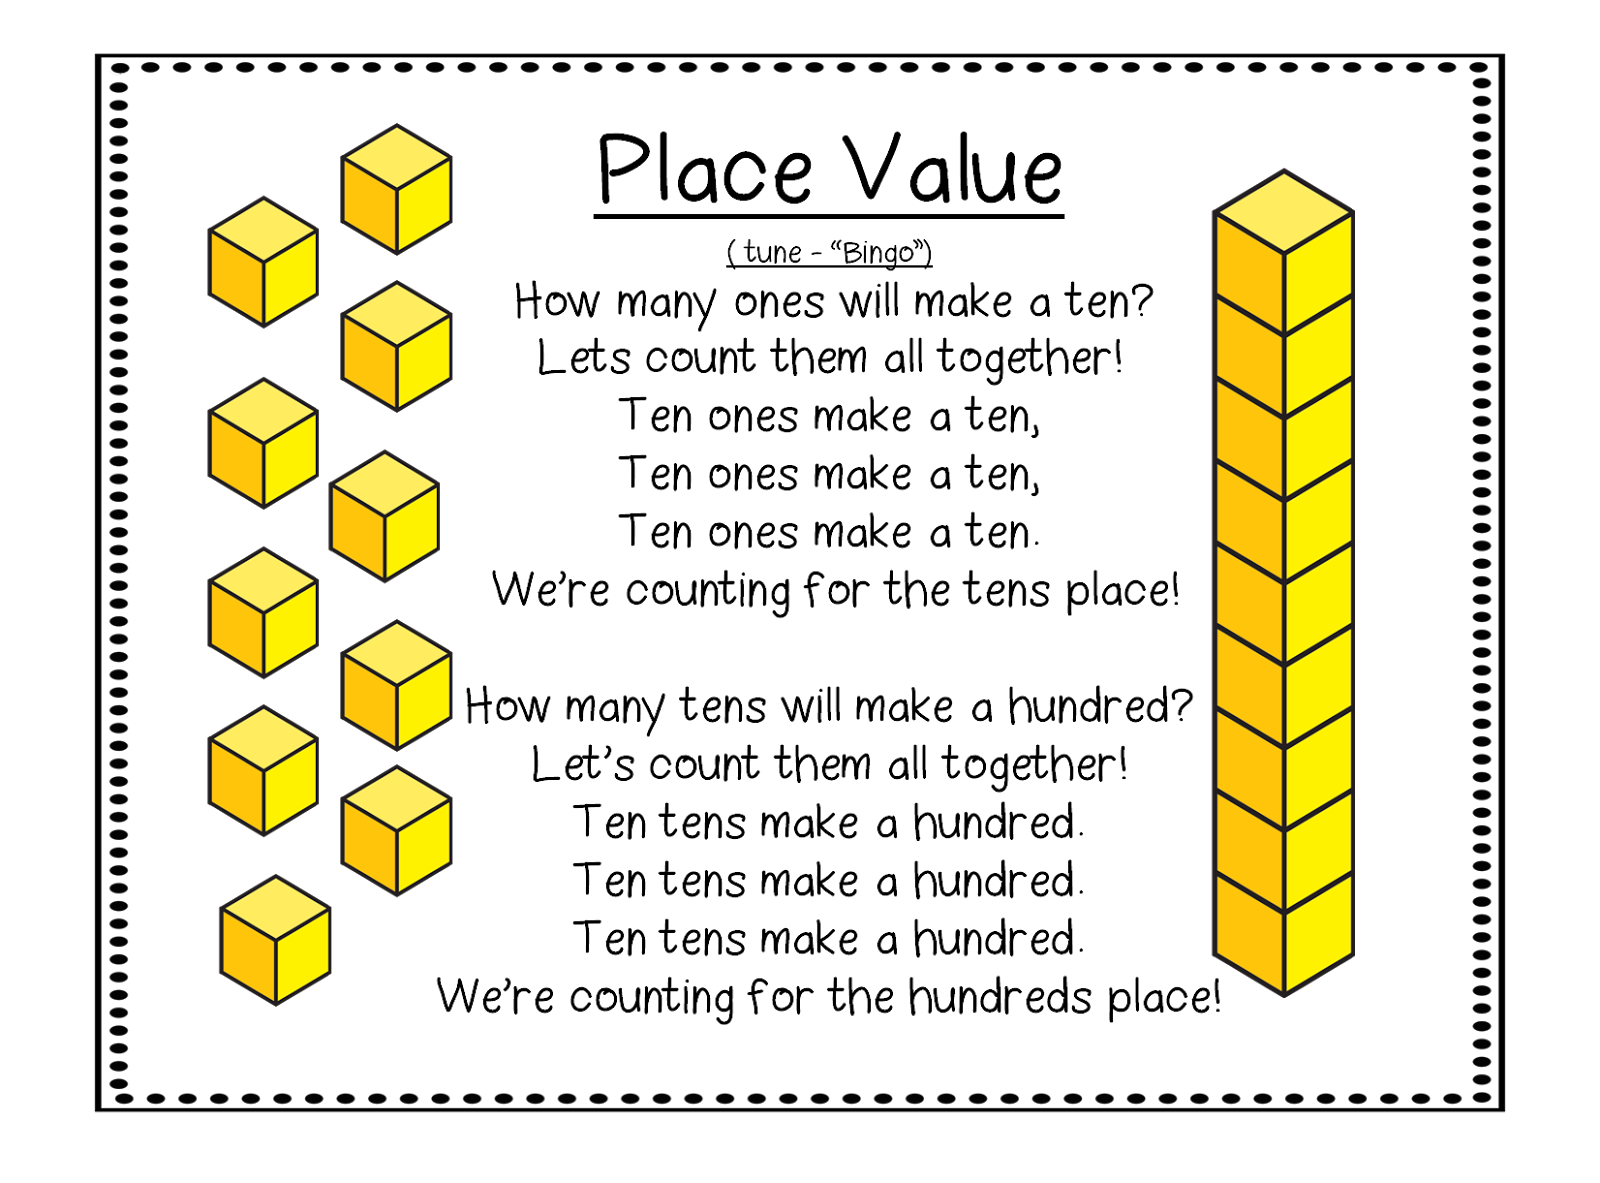 cube clipart place value